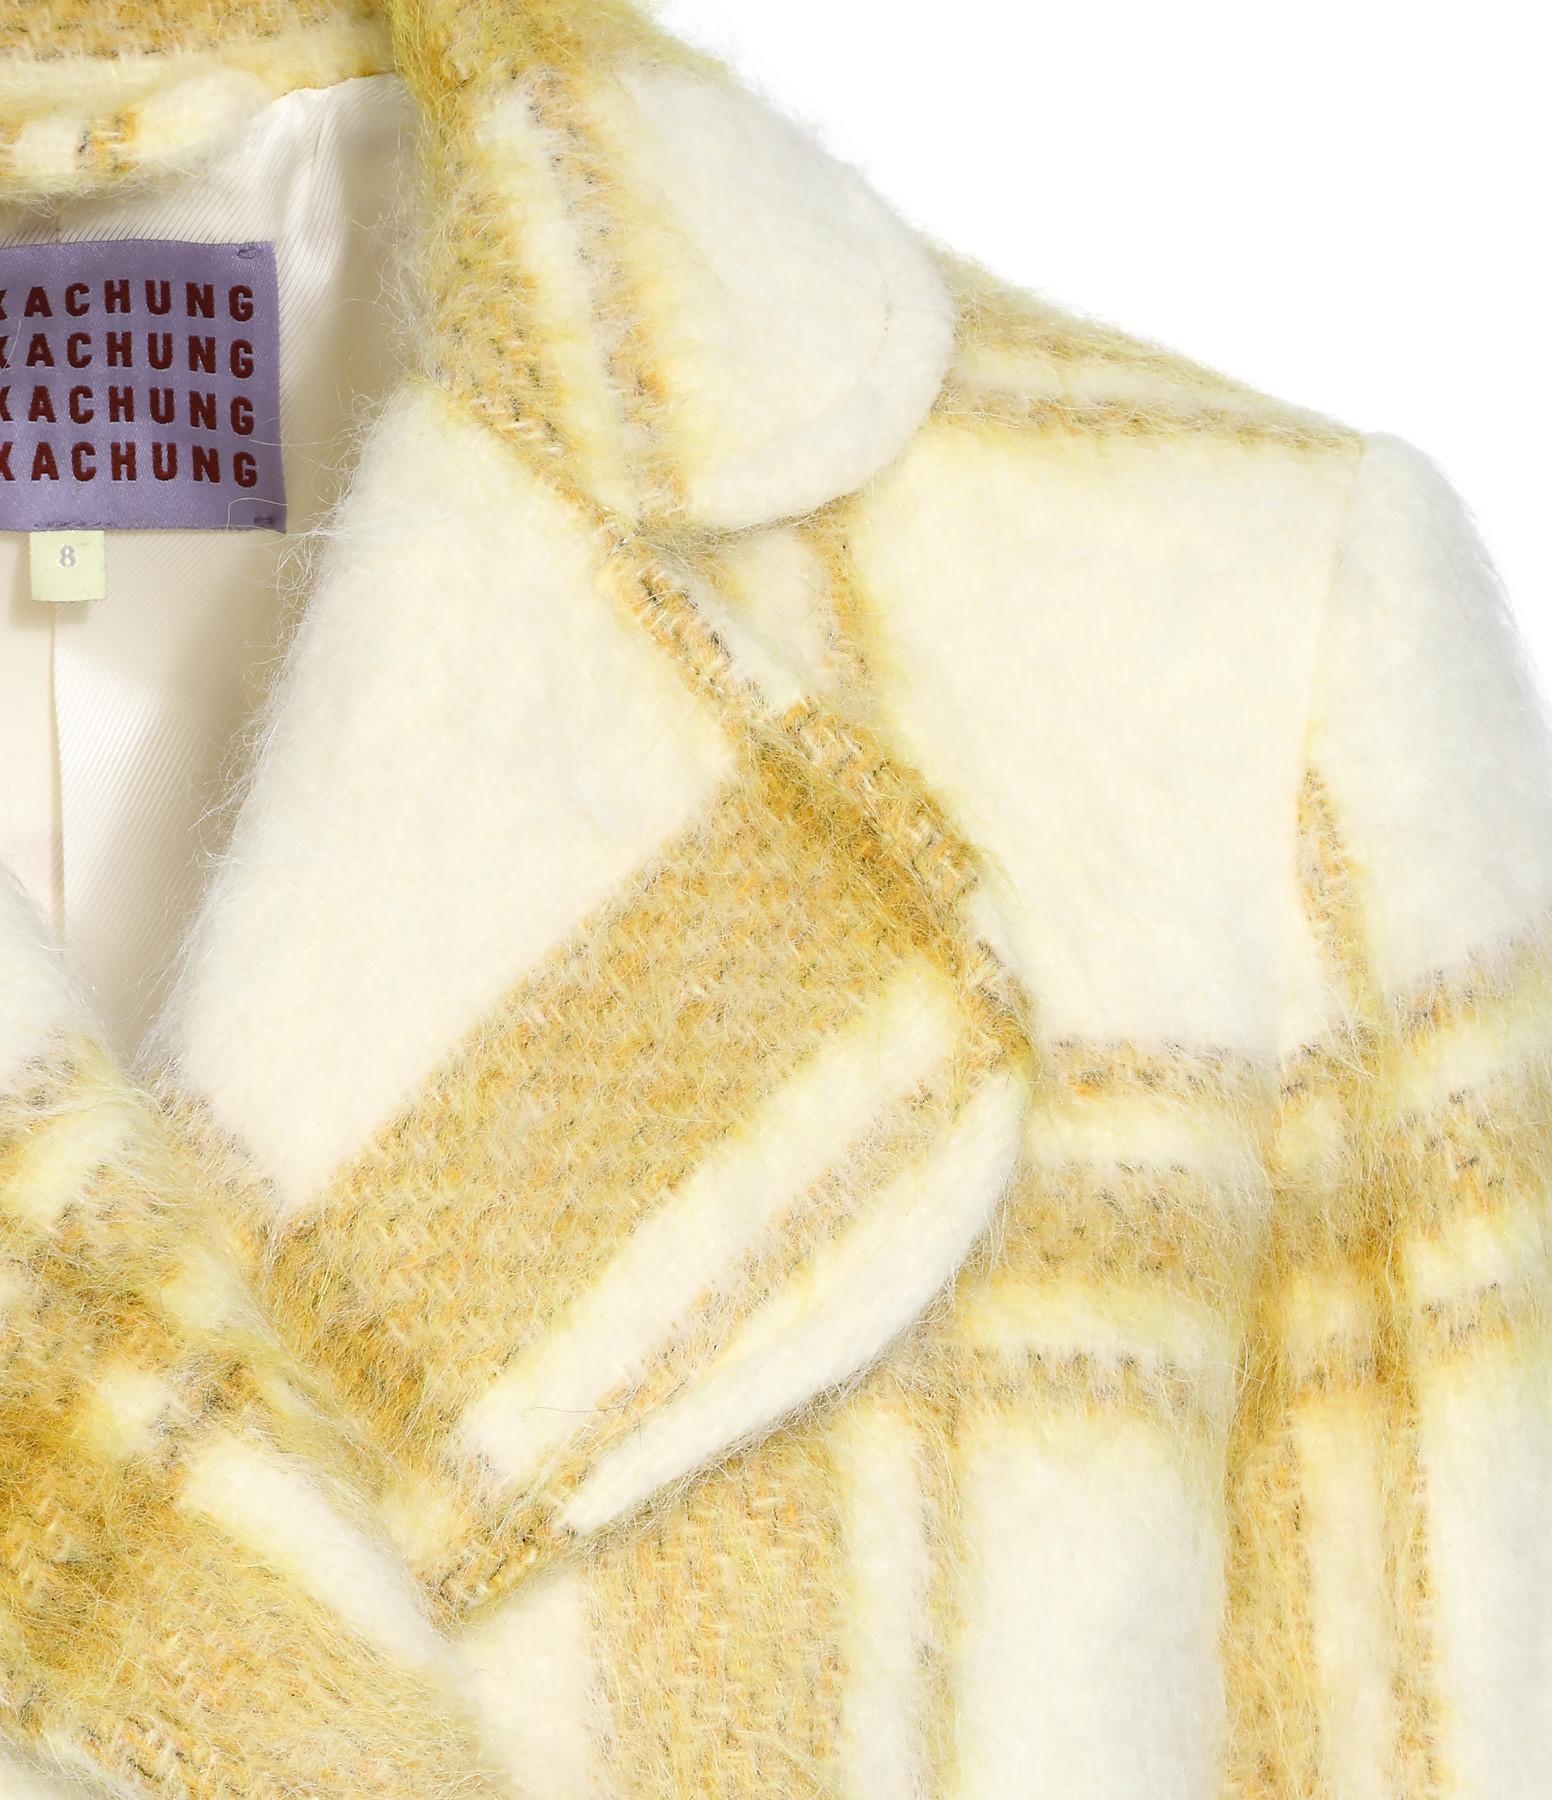 ALEXA CHUNG - Manteau Laine Mohair Carreaux Jaune Blanc